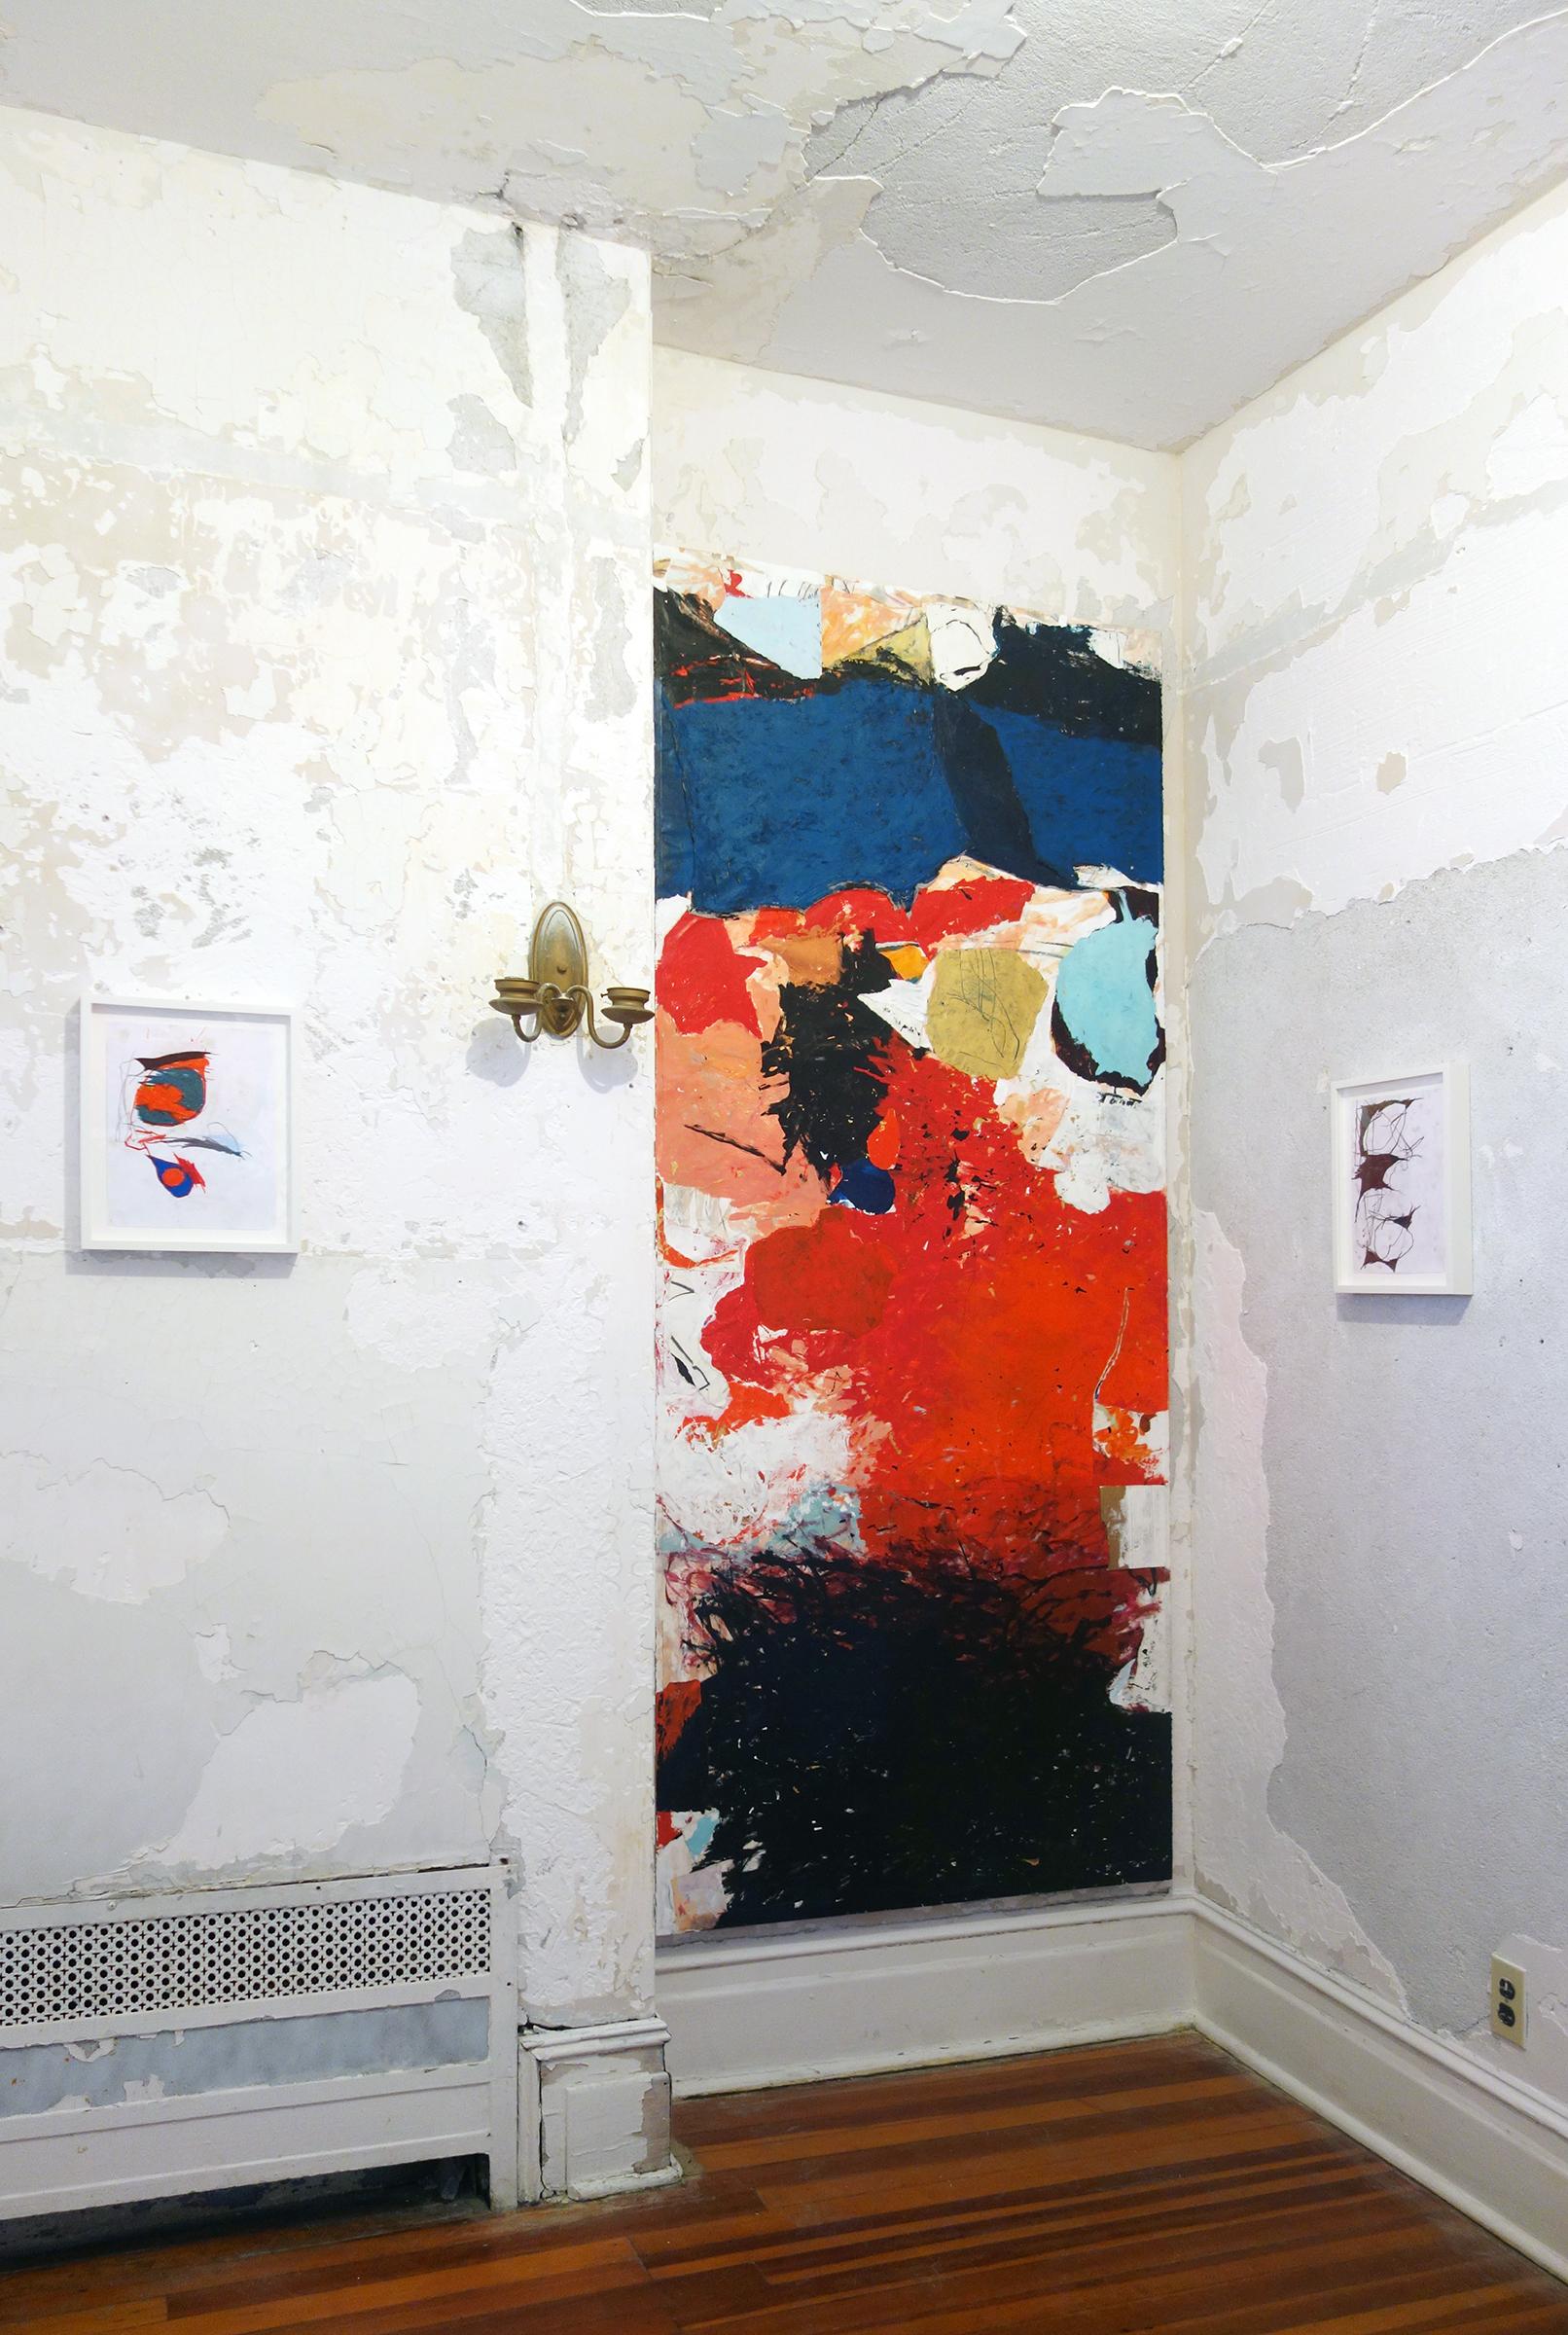 JOSEPH HART NADA House installation